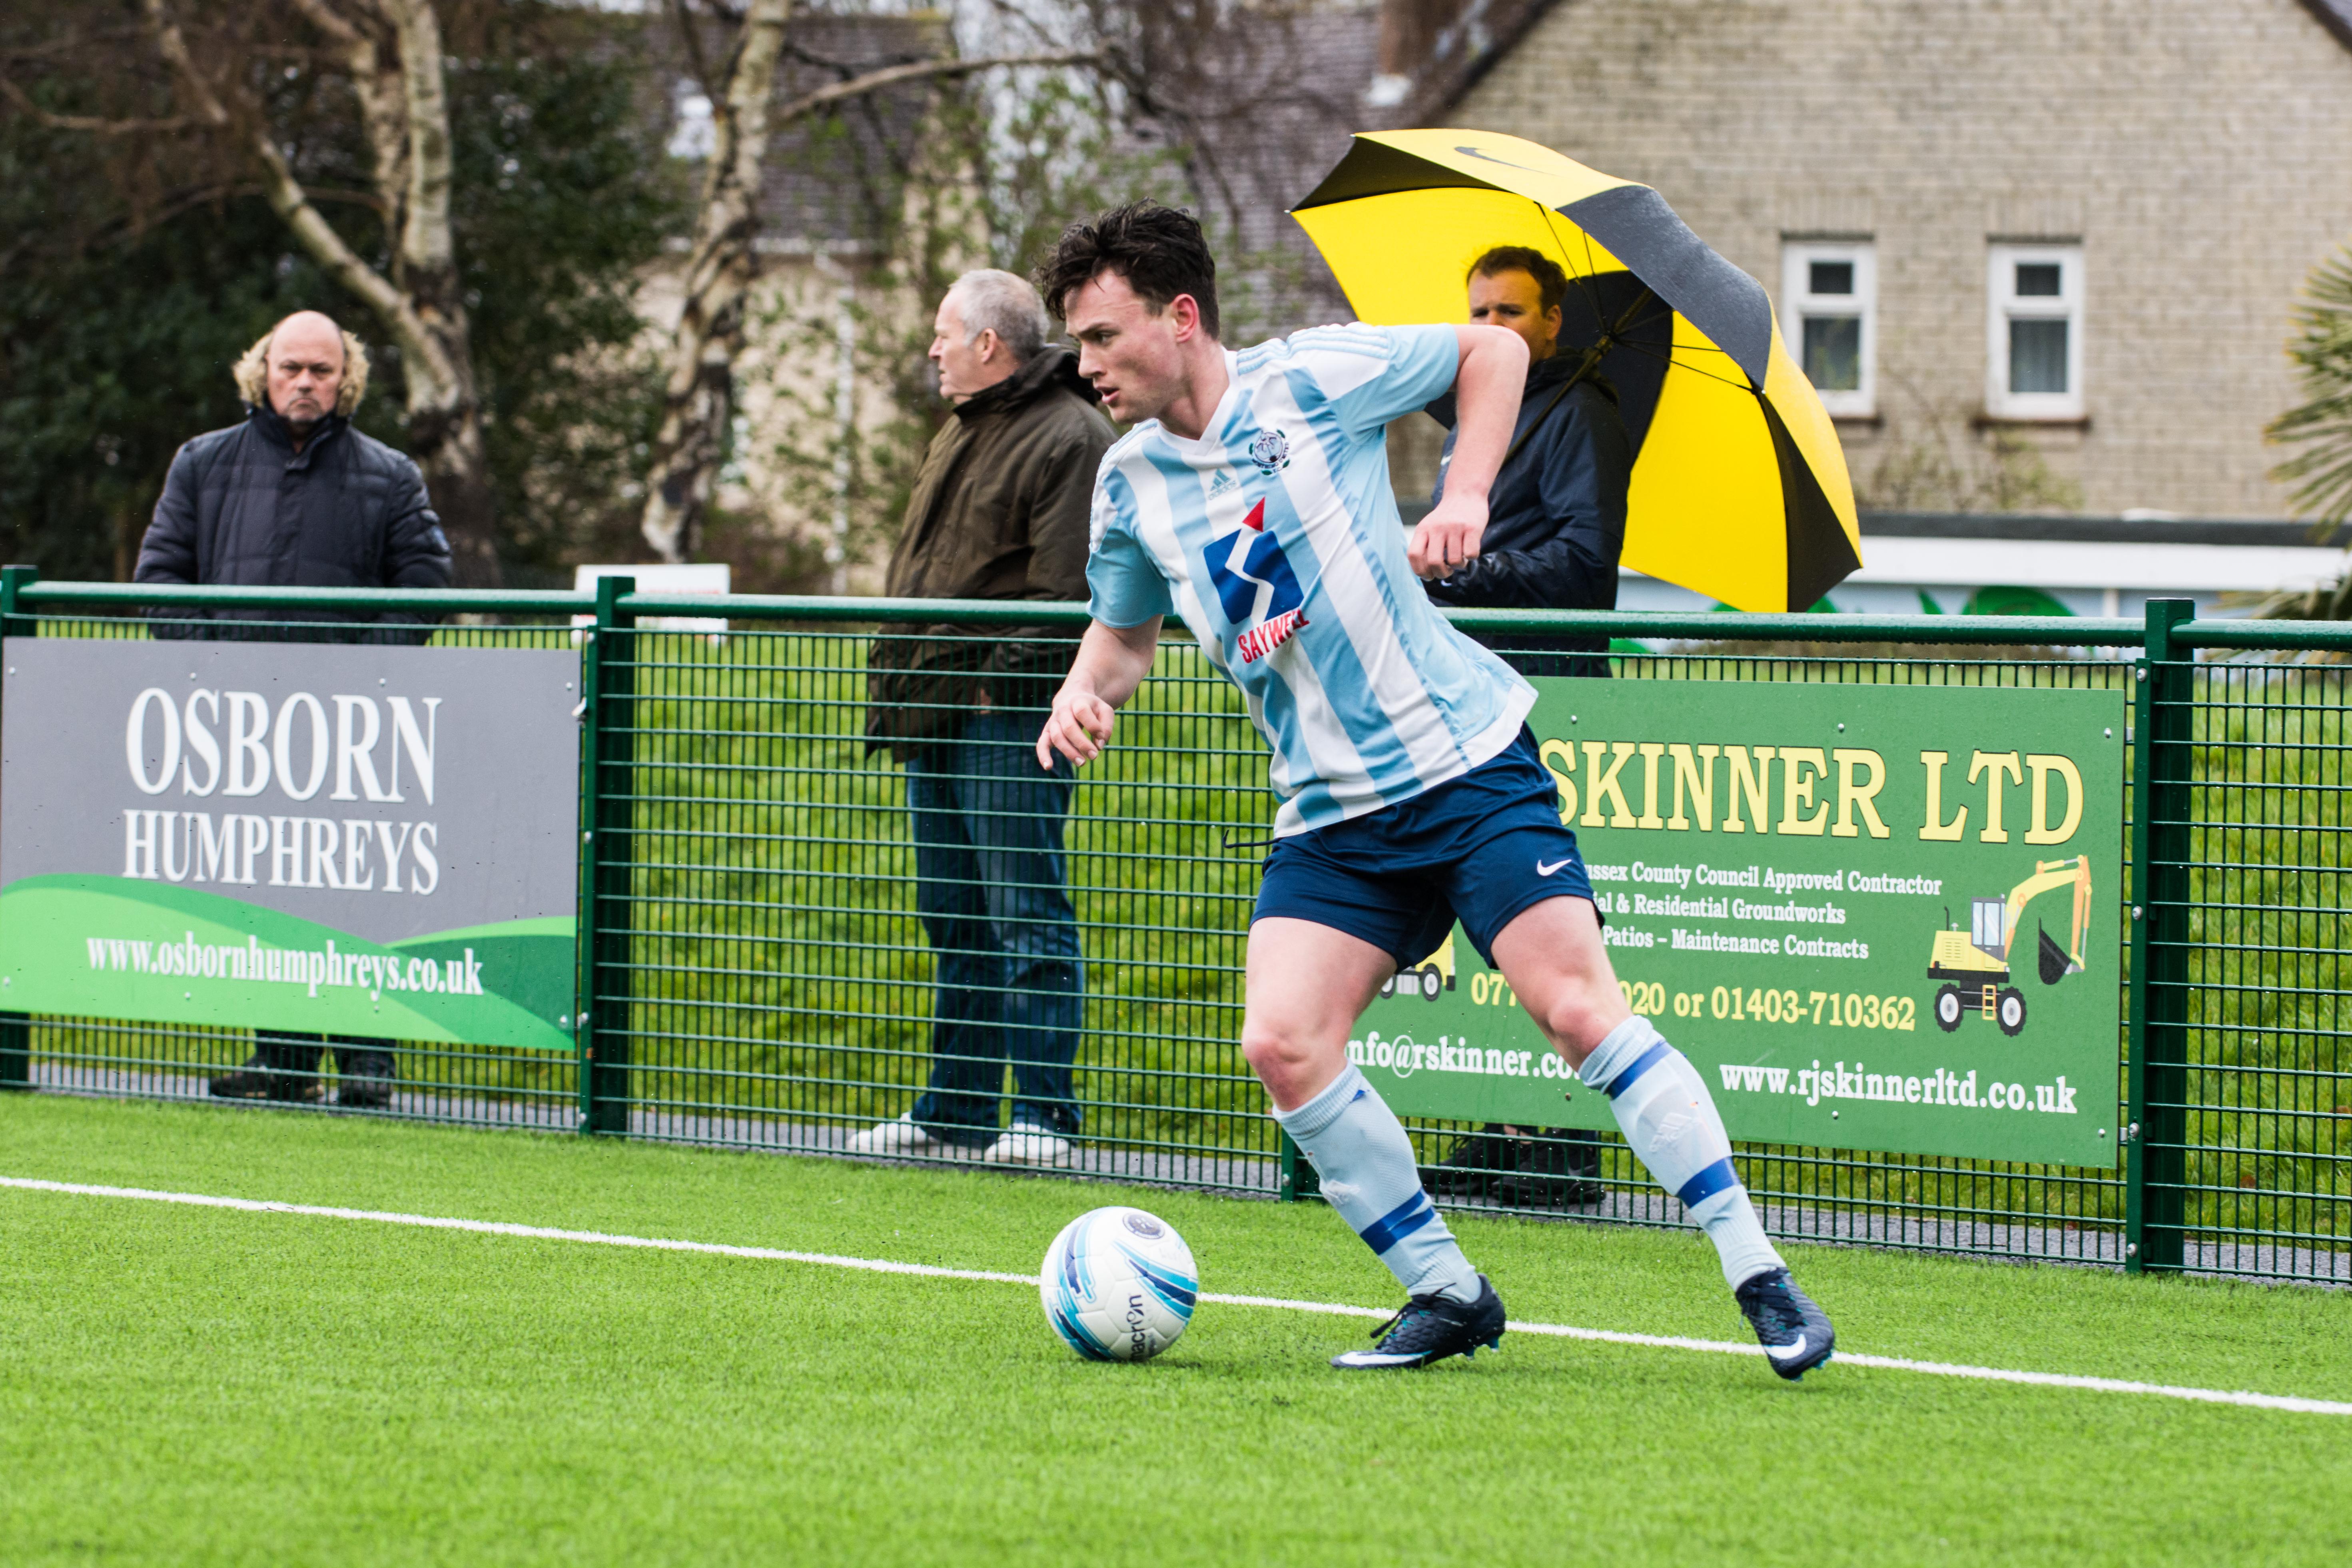 DAVID_JEFFERY Worthing United FC vs East Preston FC 02.04.18 49